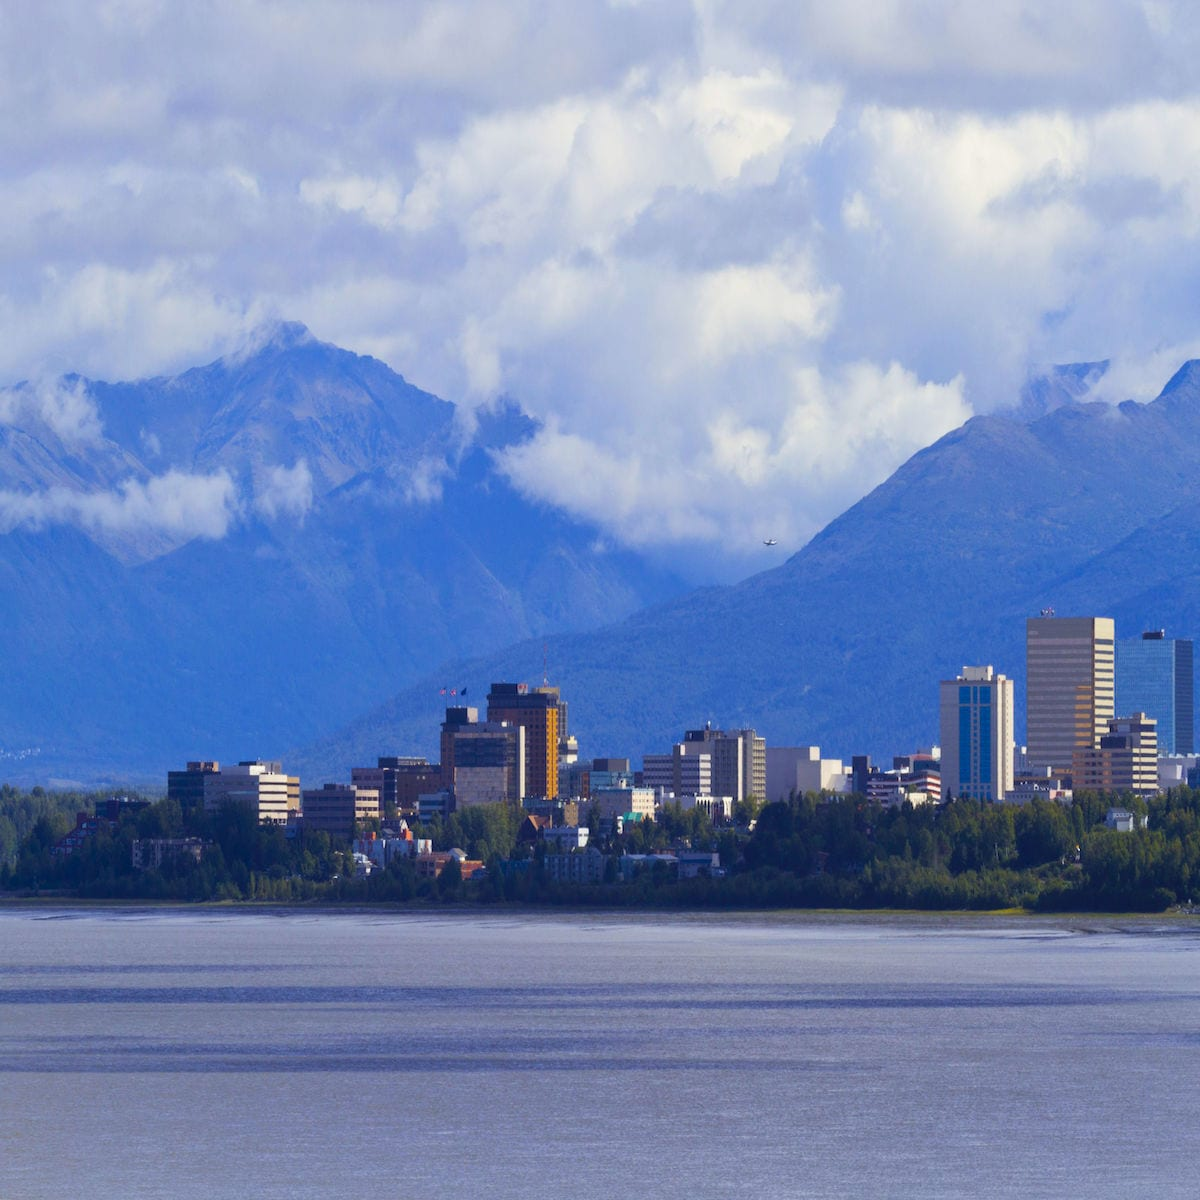 Anchorage Alaska Chiropractic Practice for Sale